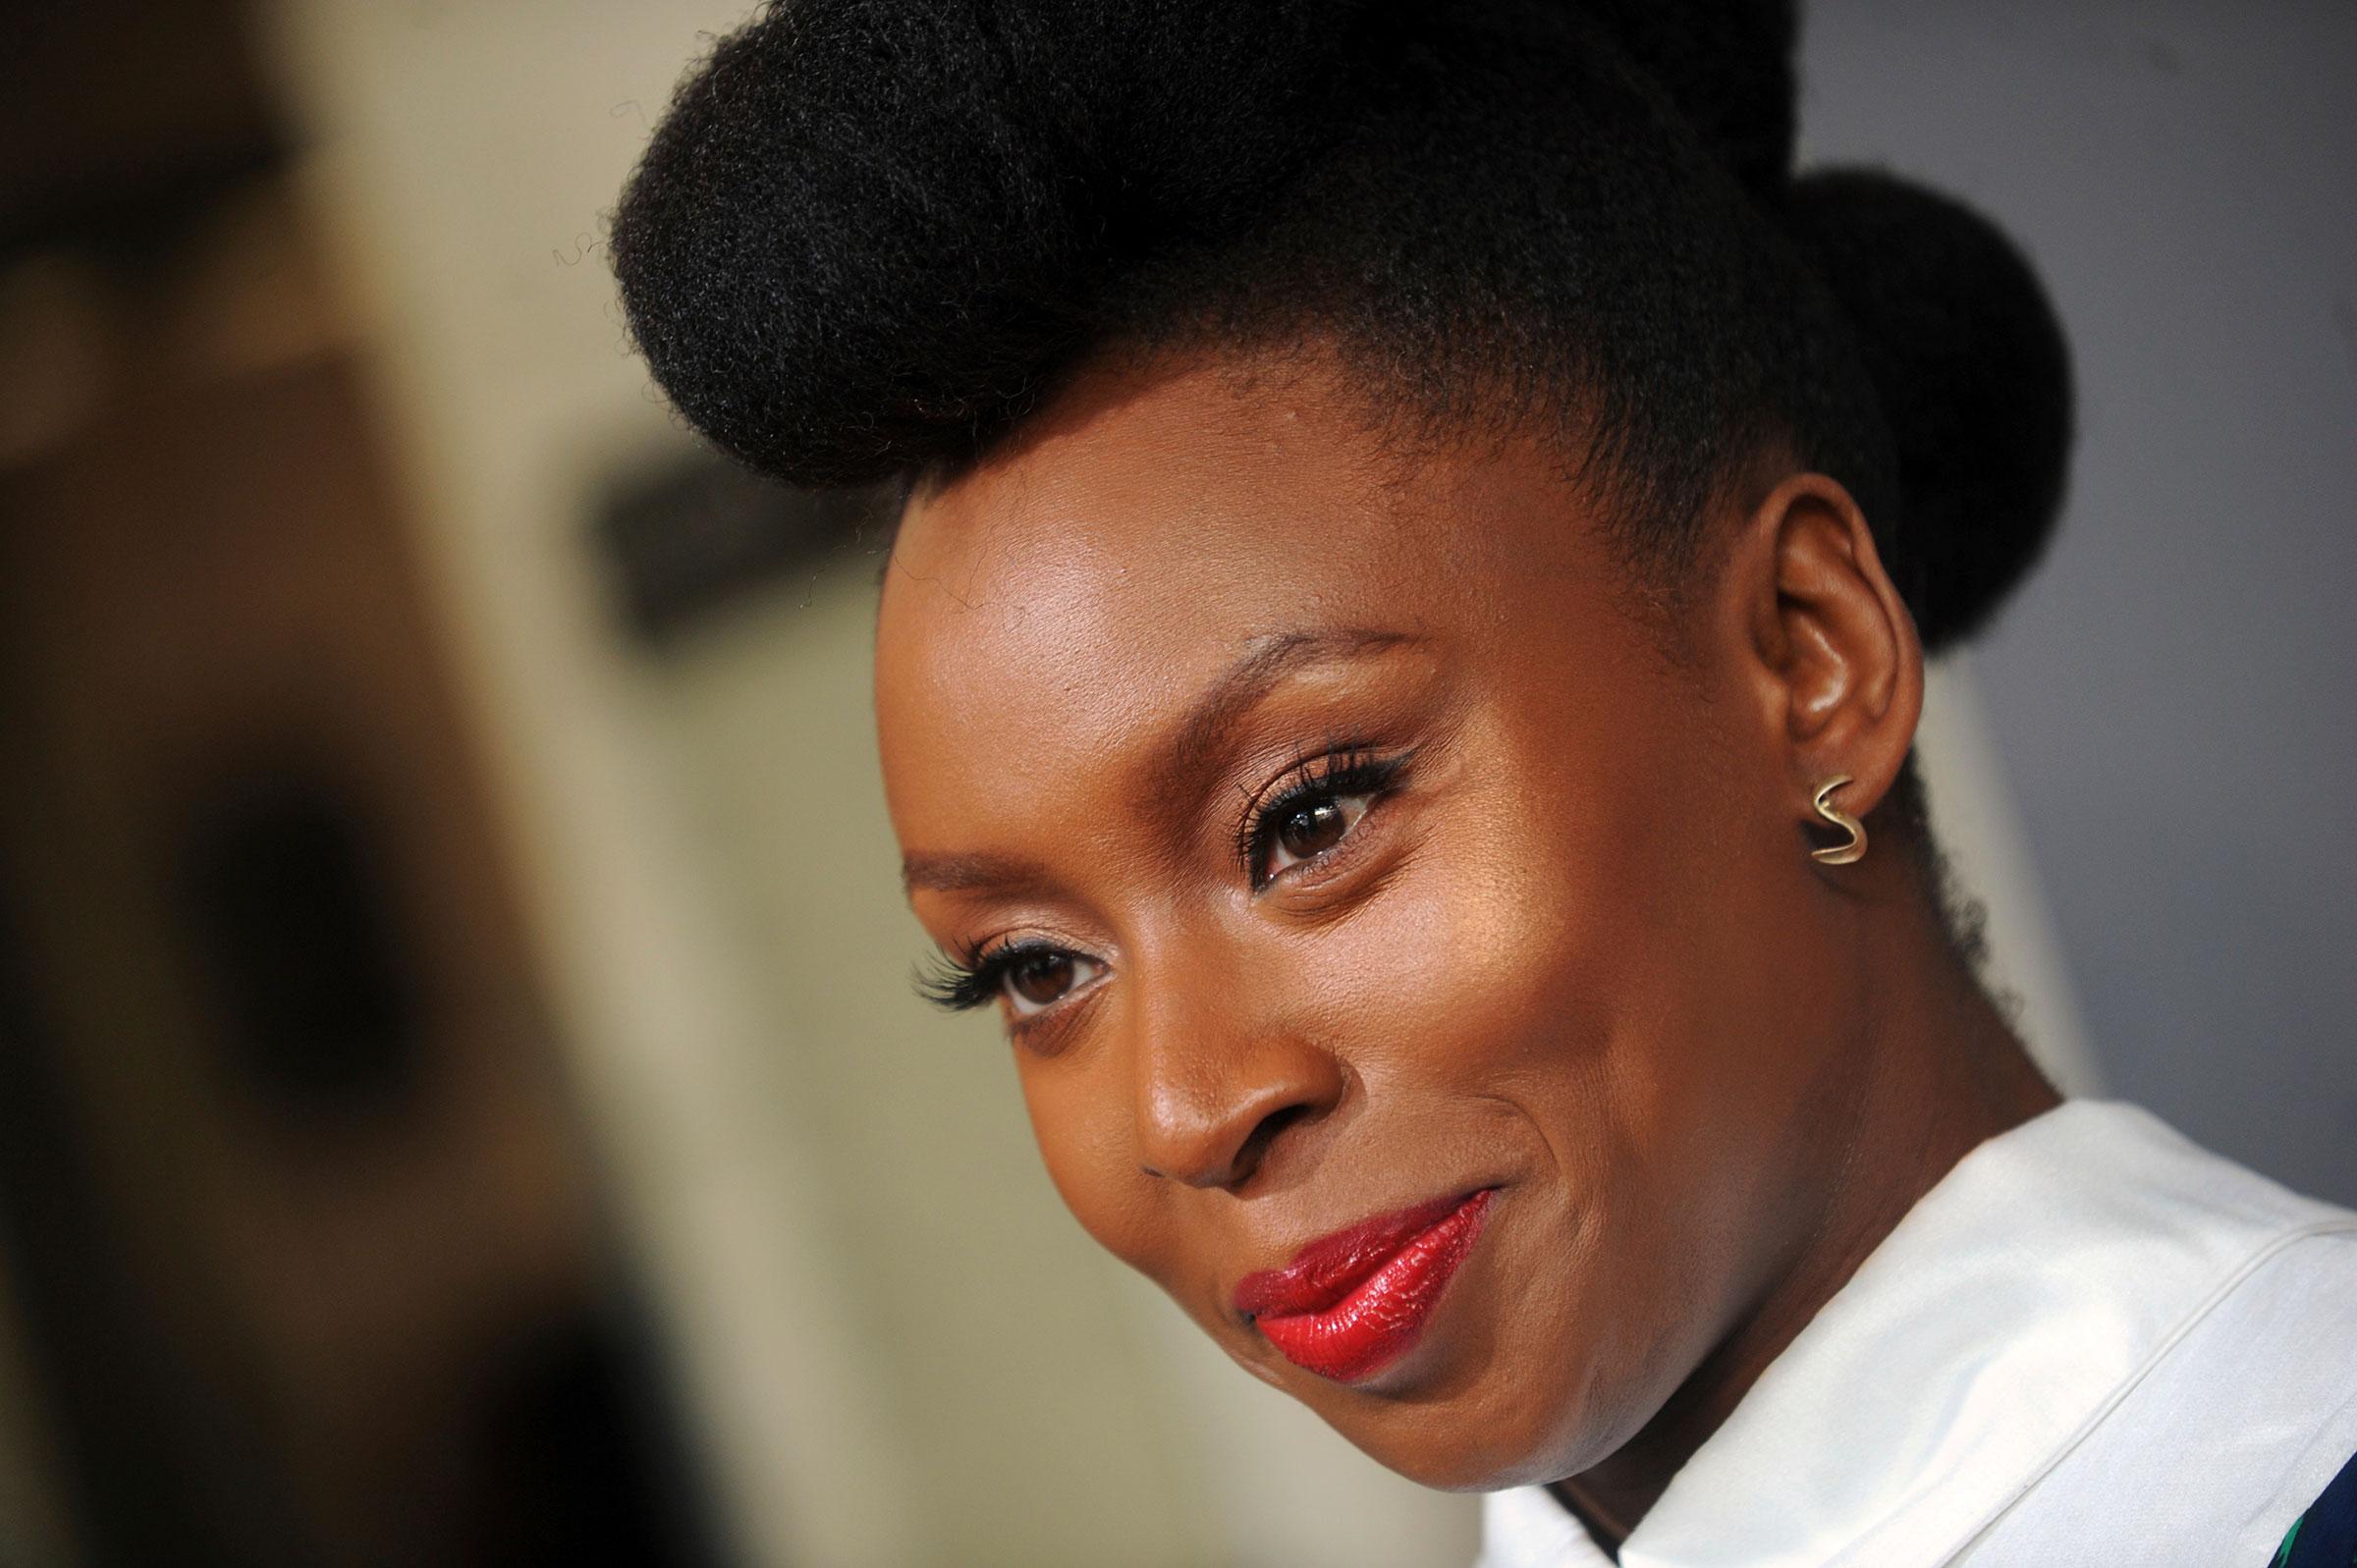 Chimamanda Ngozi Adichie in New York City on April 5, 2017.